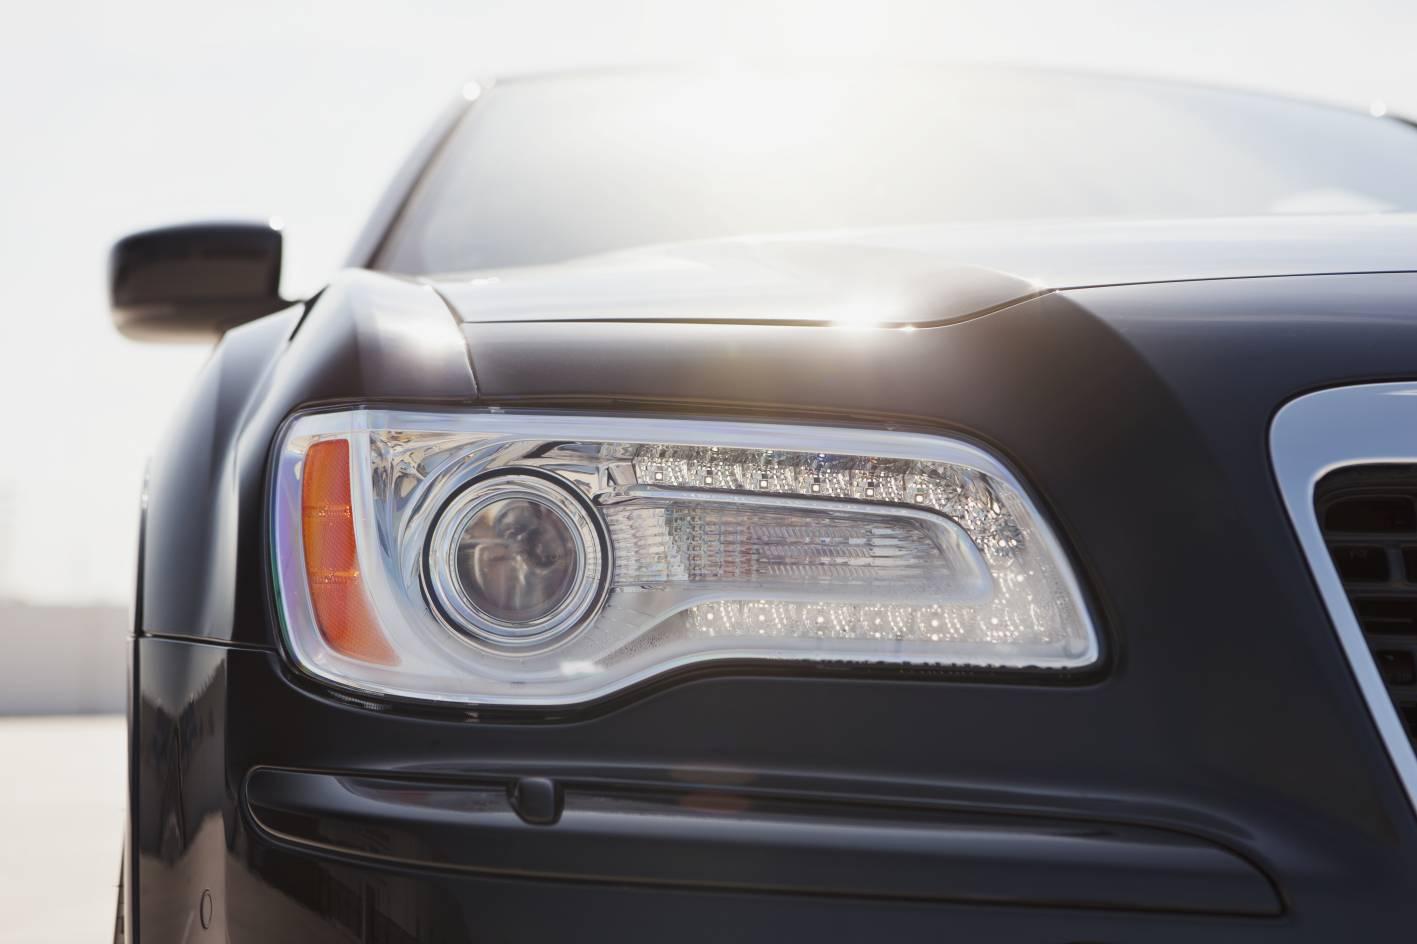 Chrysler Headlight Condensation Problem Auto Expert By John